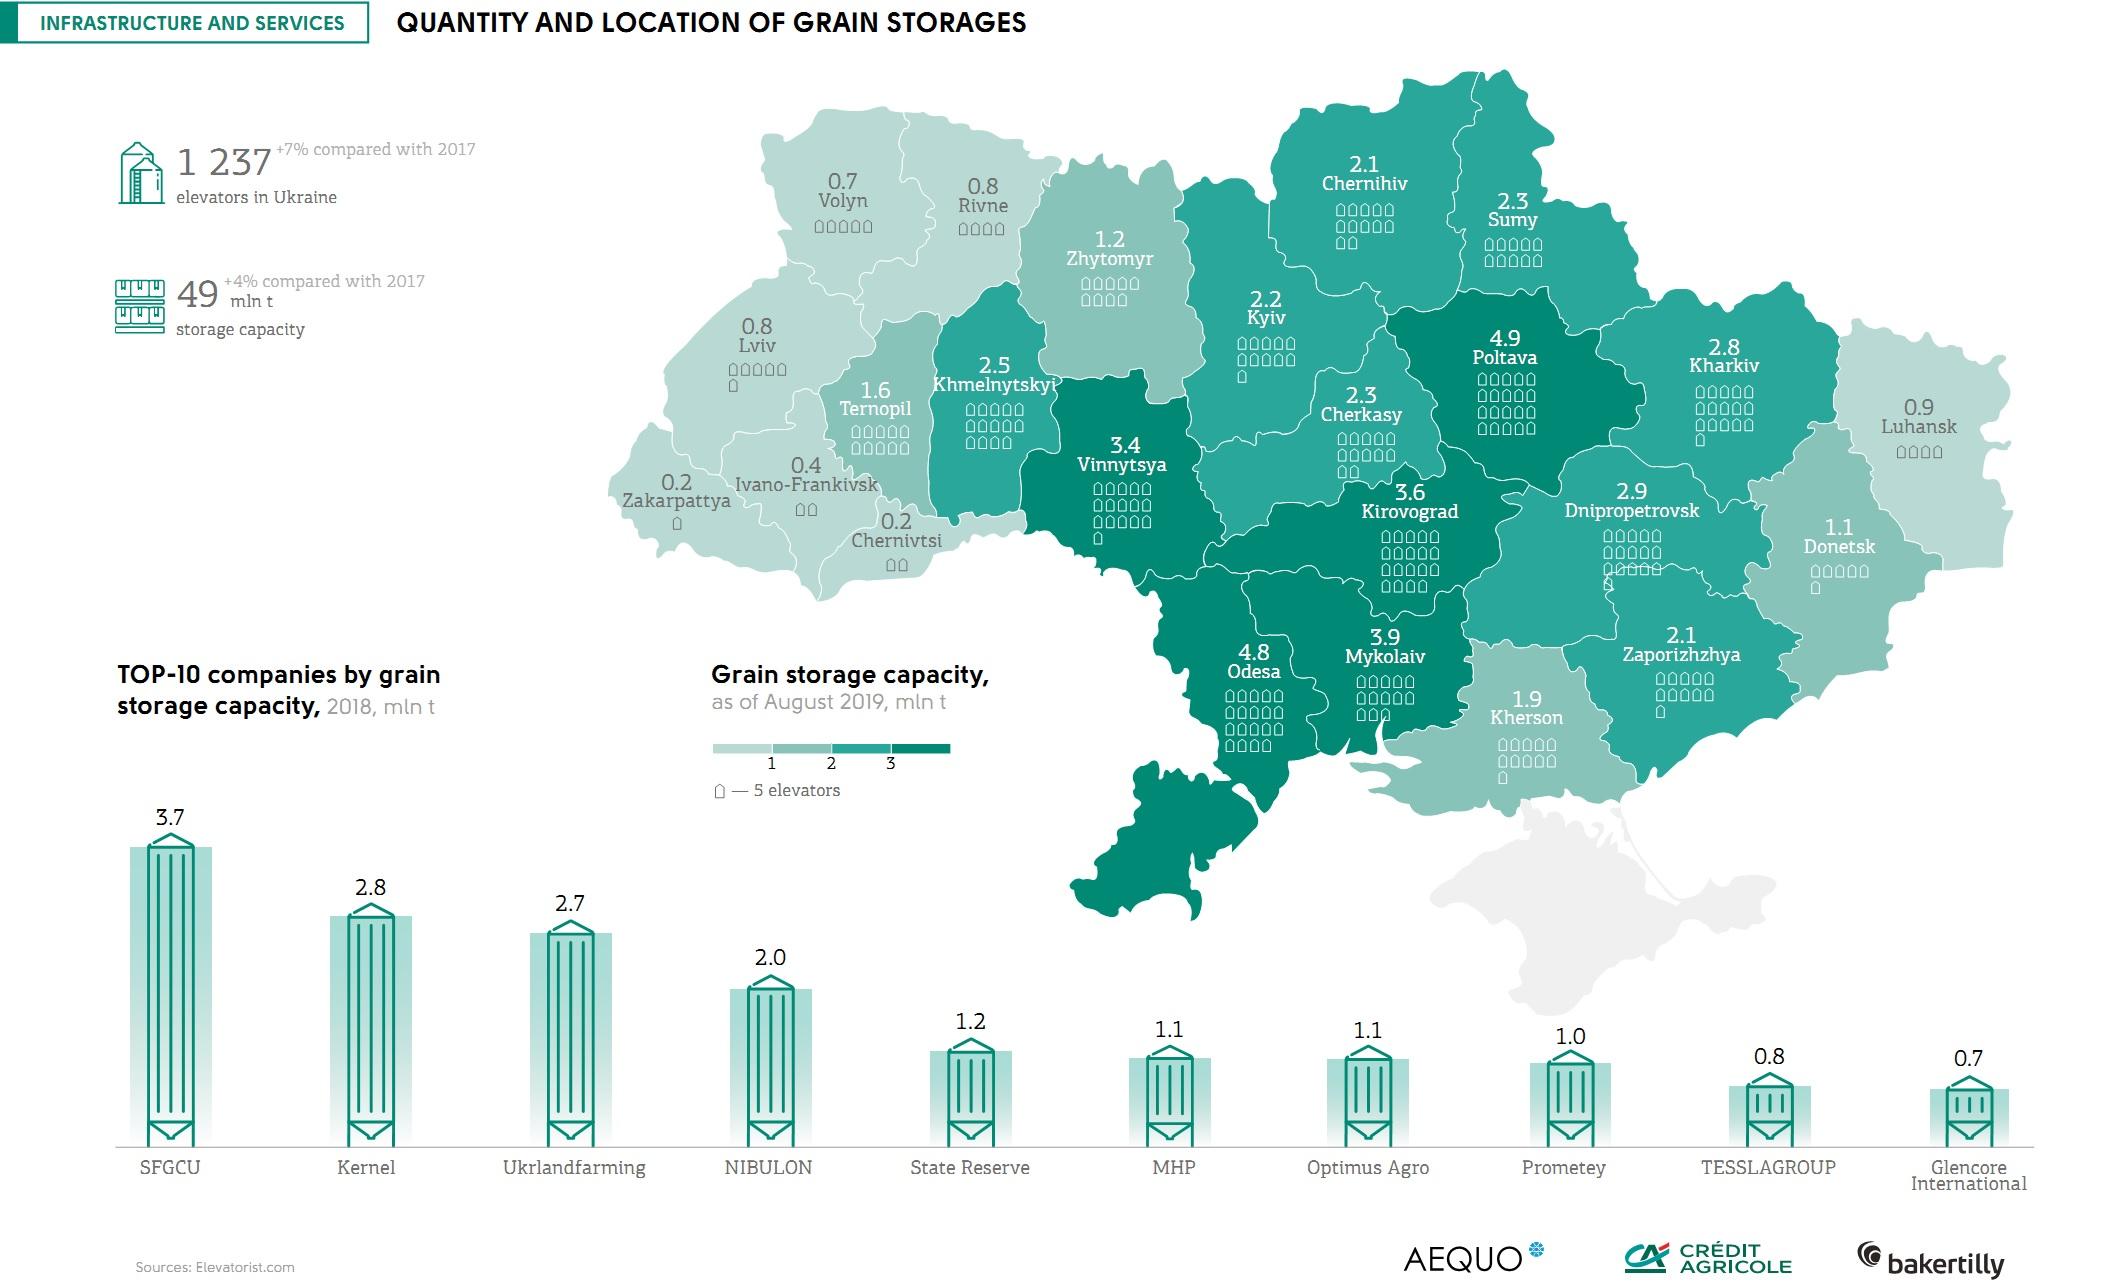 Grain storage network in Ukraine (click for full resolution)